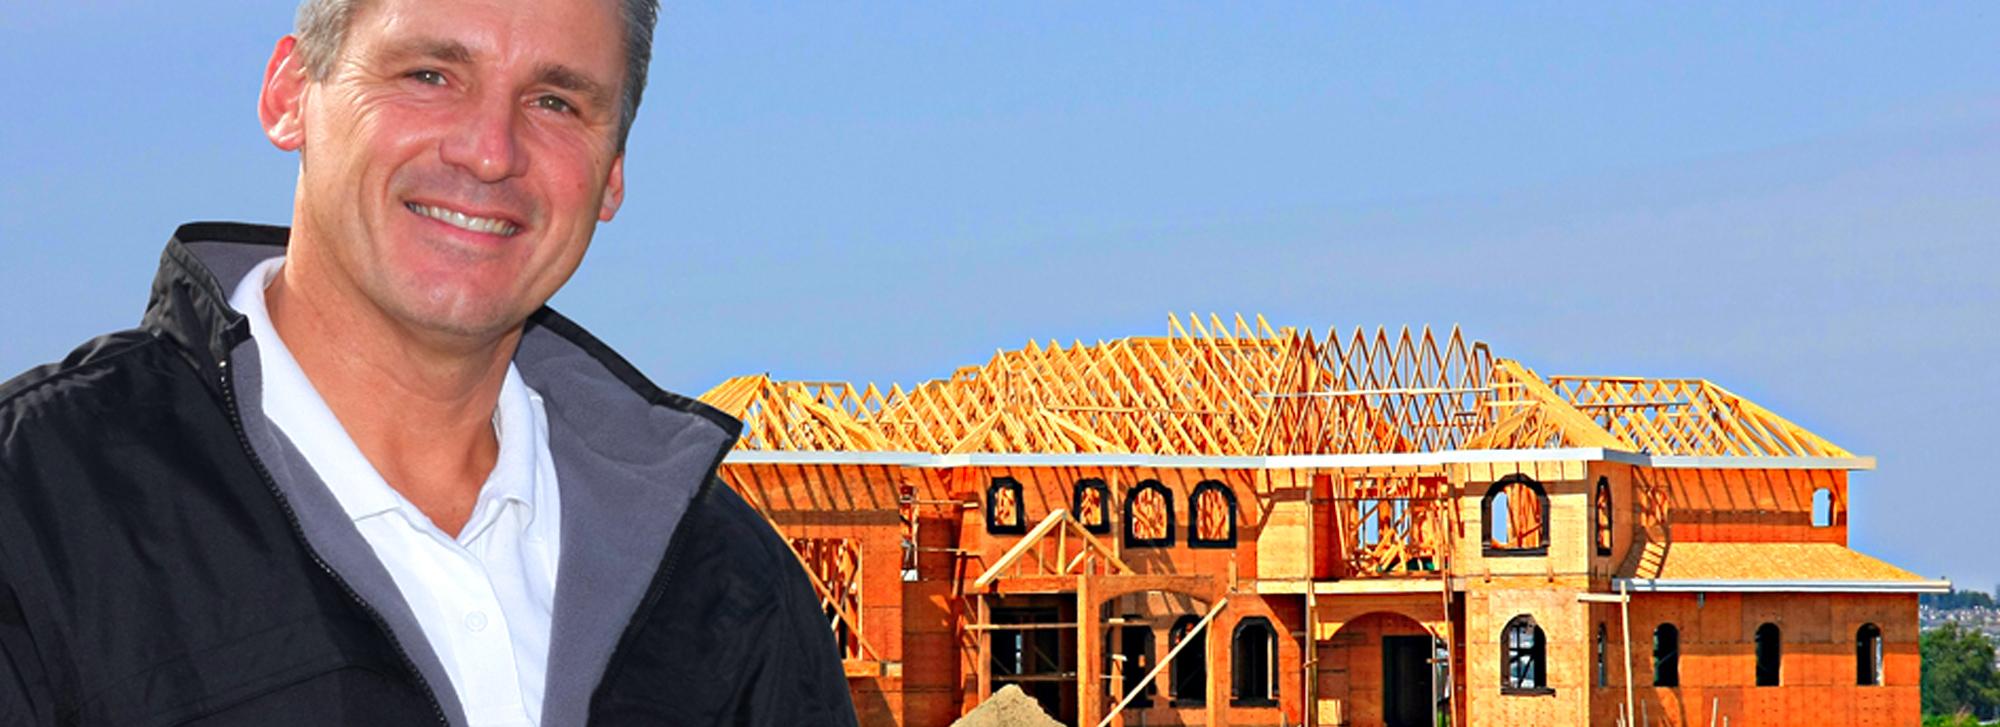 Property Renovation Inspectors